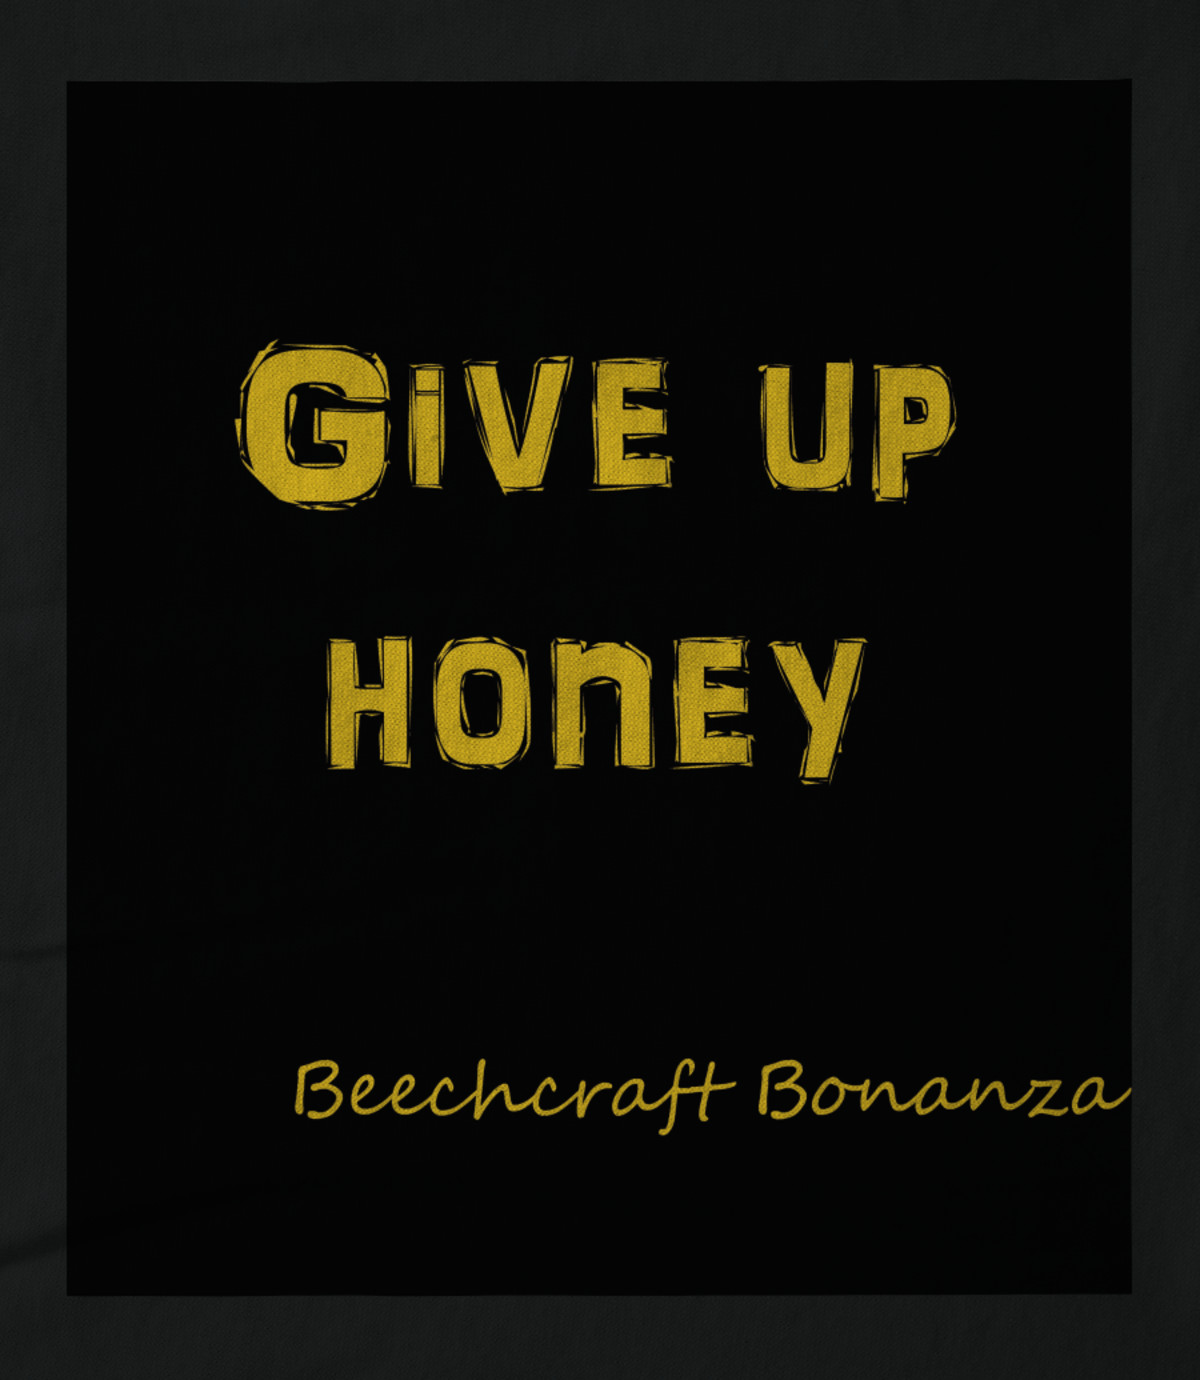 Beechcraft bonanza give up honey ep t 1526470822